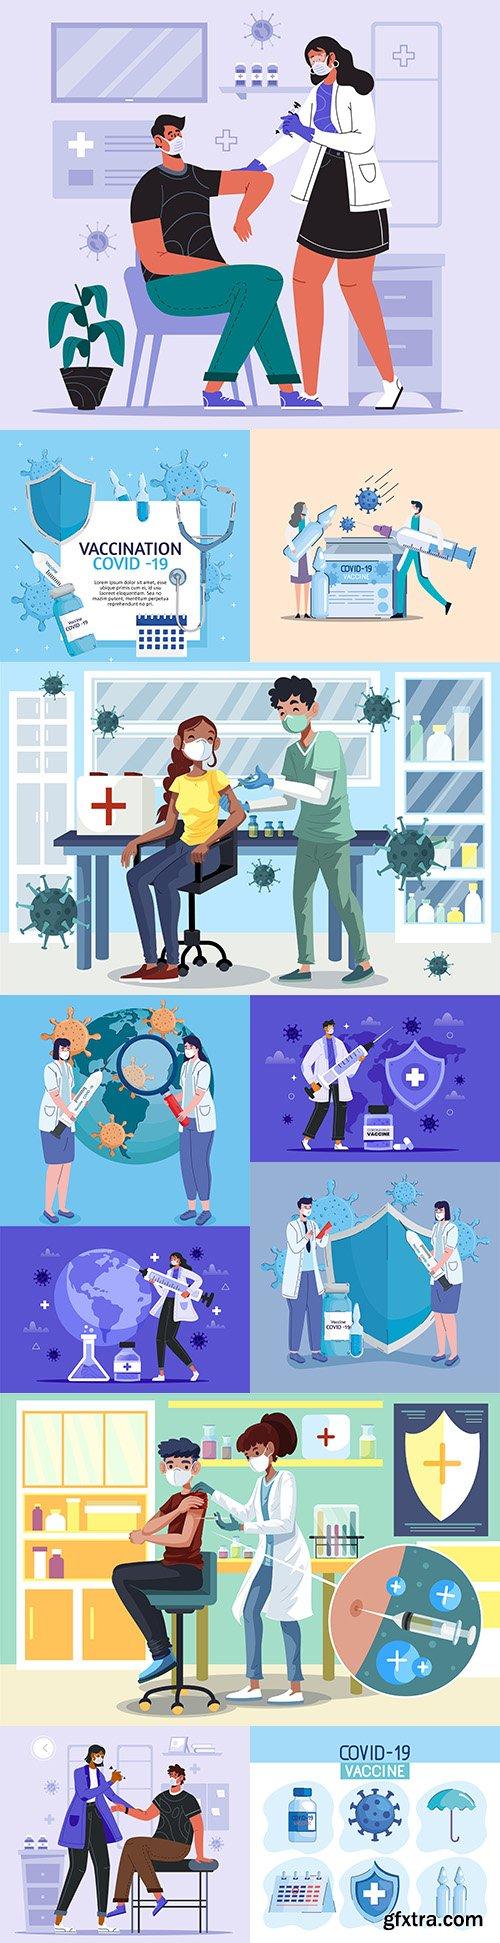 Coronavirus vaccine doctor with patient give inoculation illustration